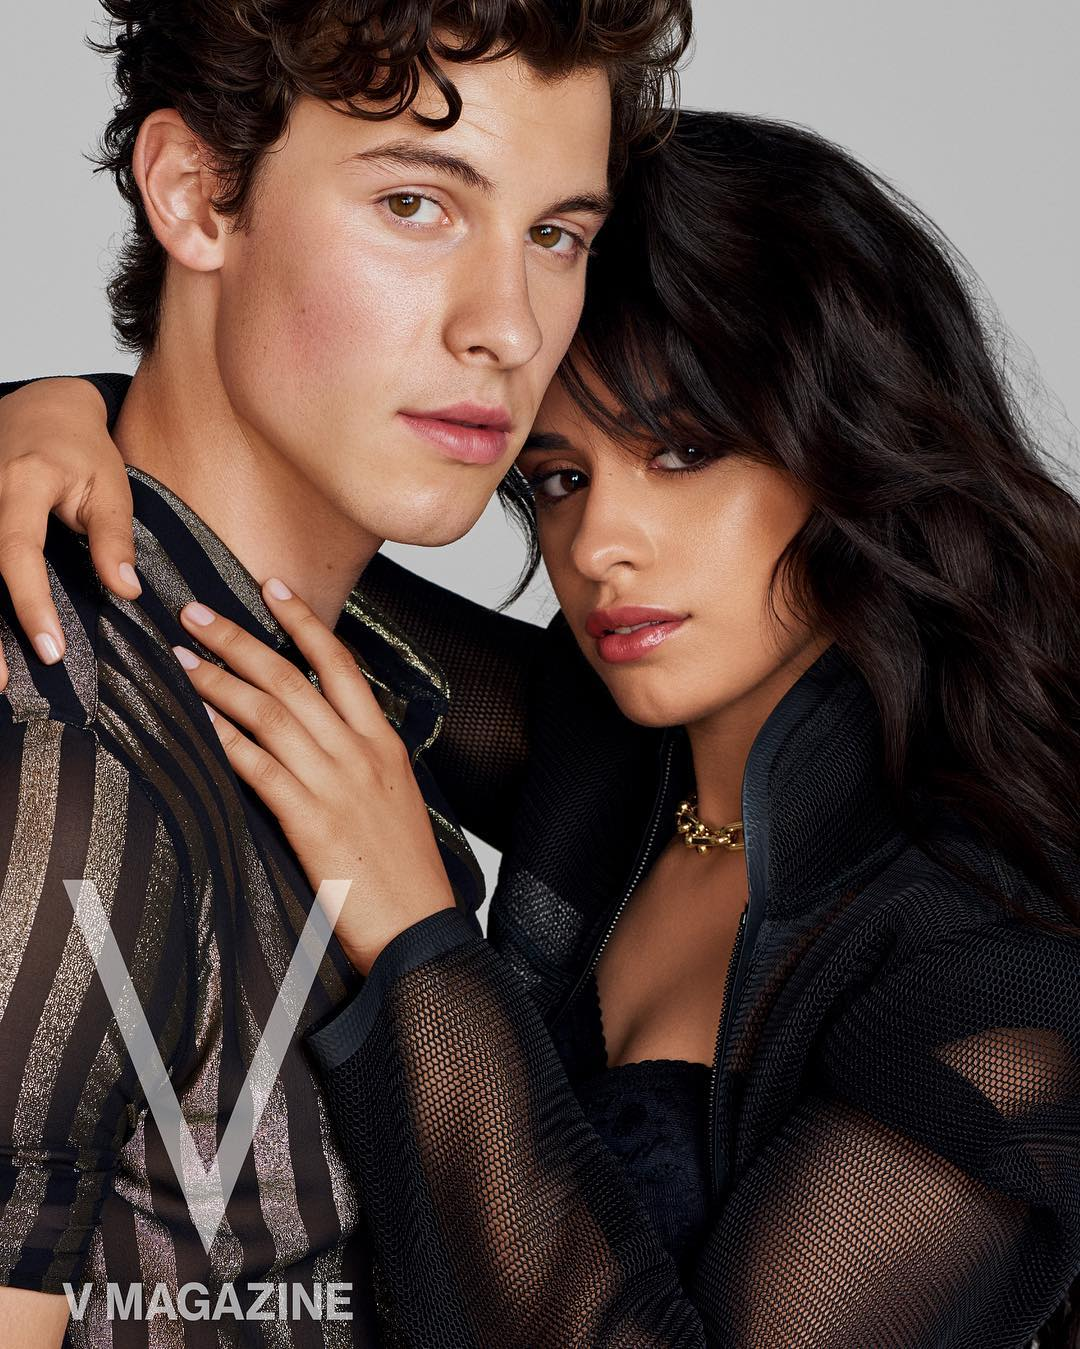 Rilis single Senorita, Shawn Mendes dan Camila Cabello berpose mesra